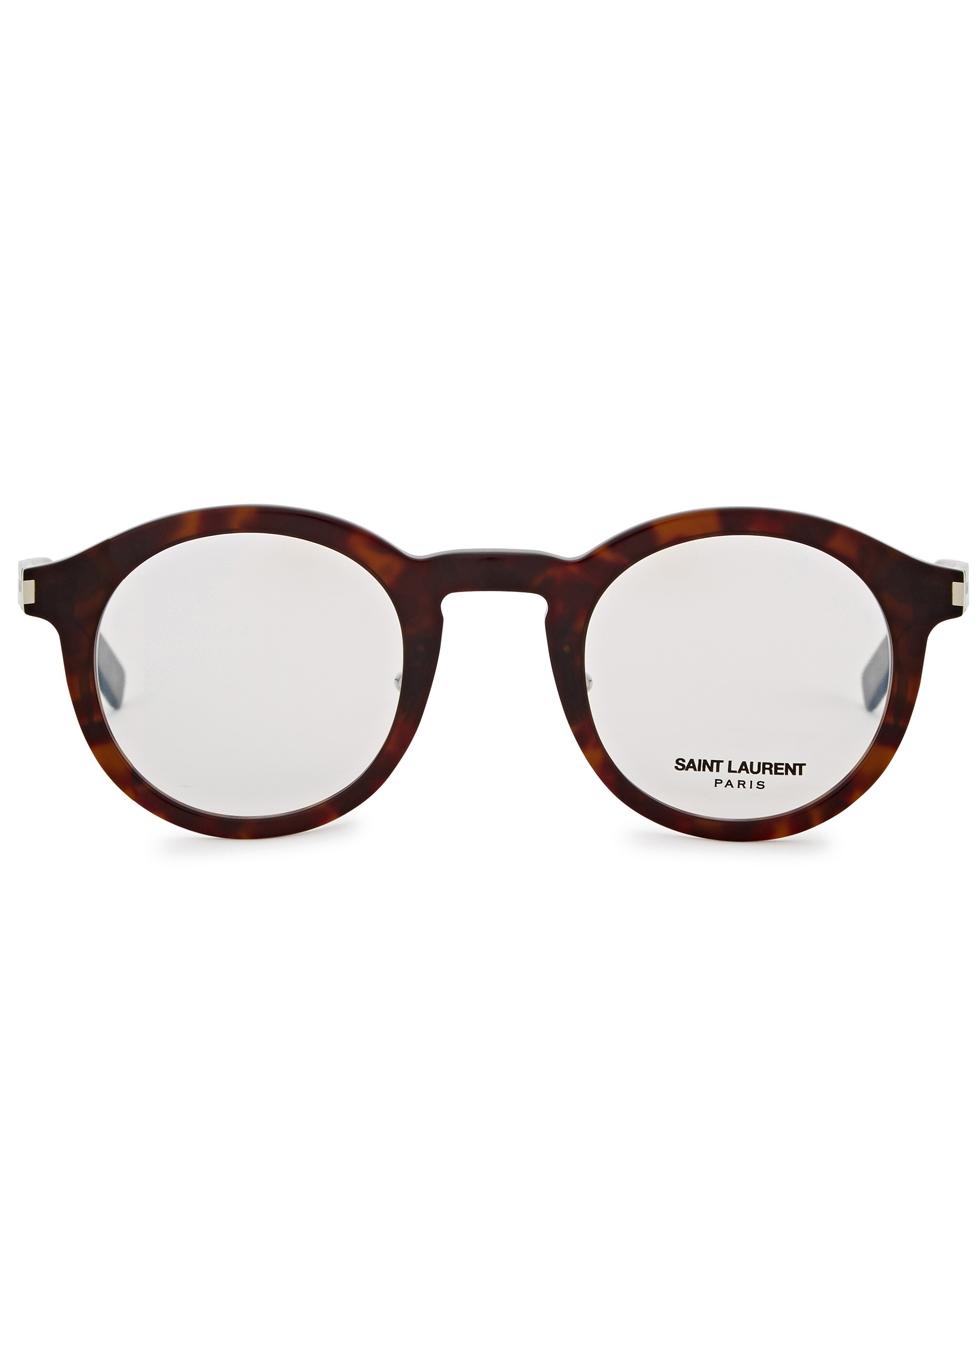 SL 140 Slim round-frame optical glasses - Saint Laurent